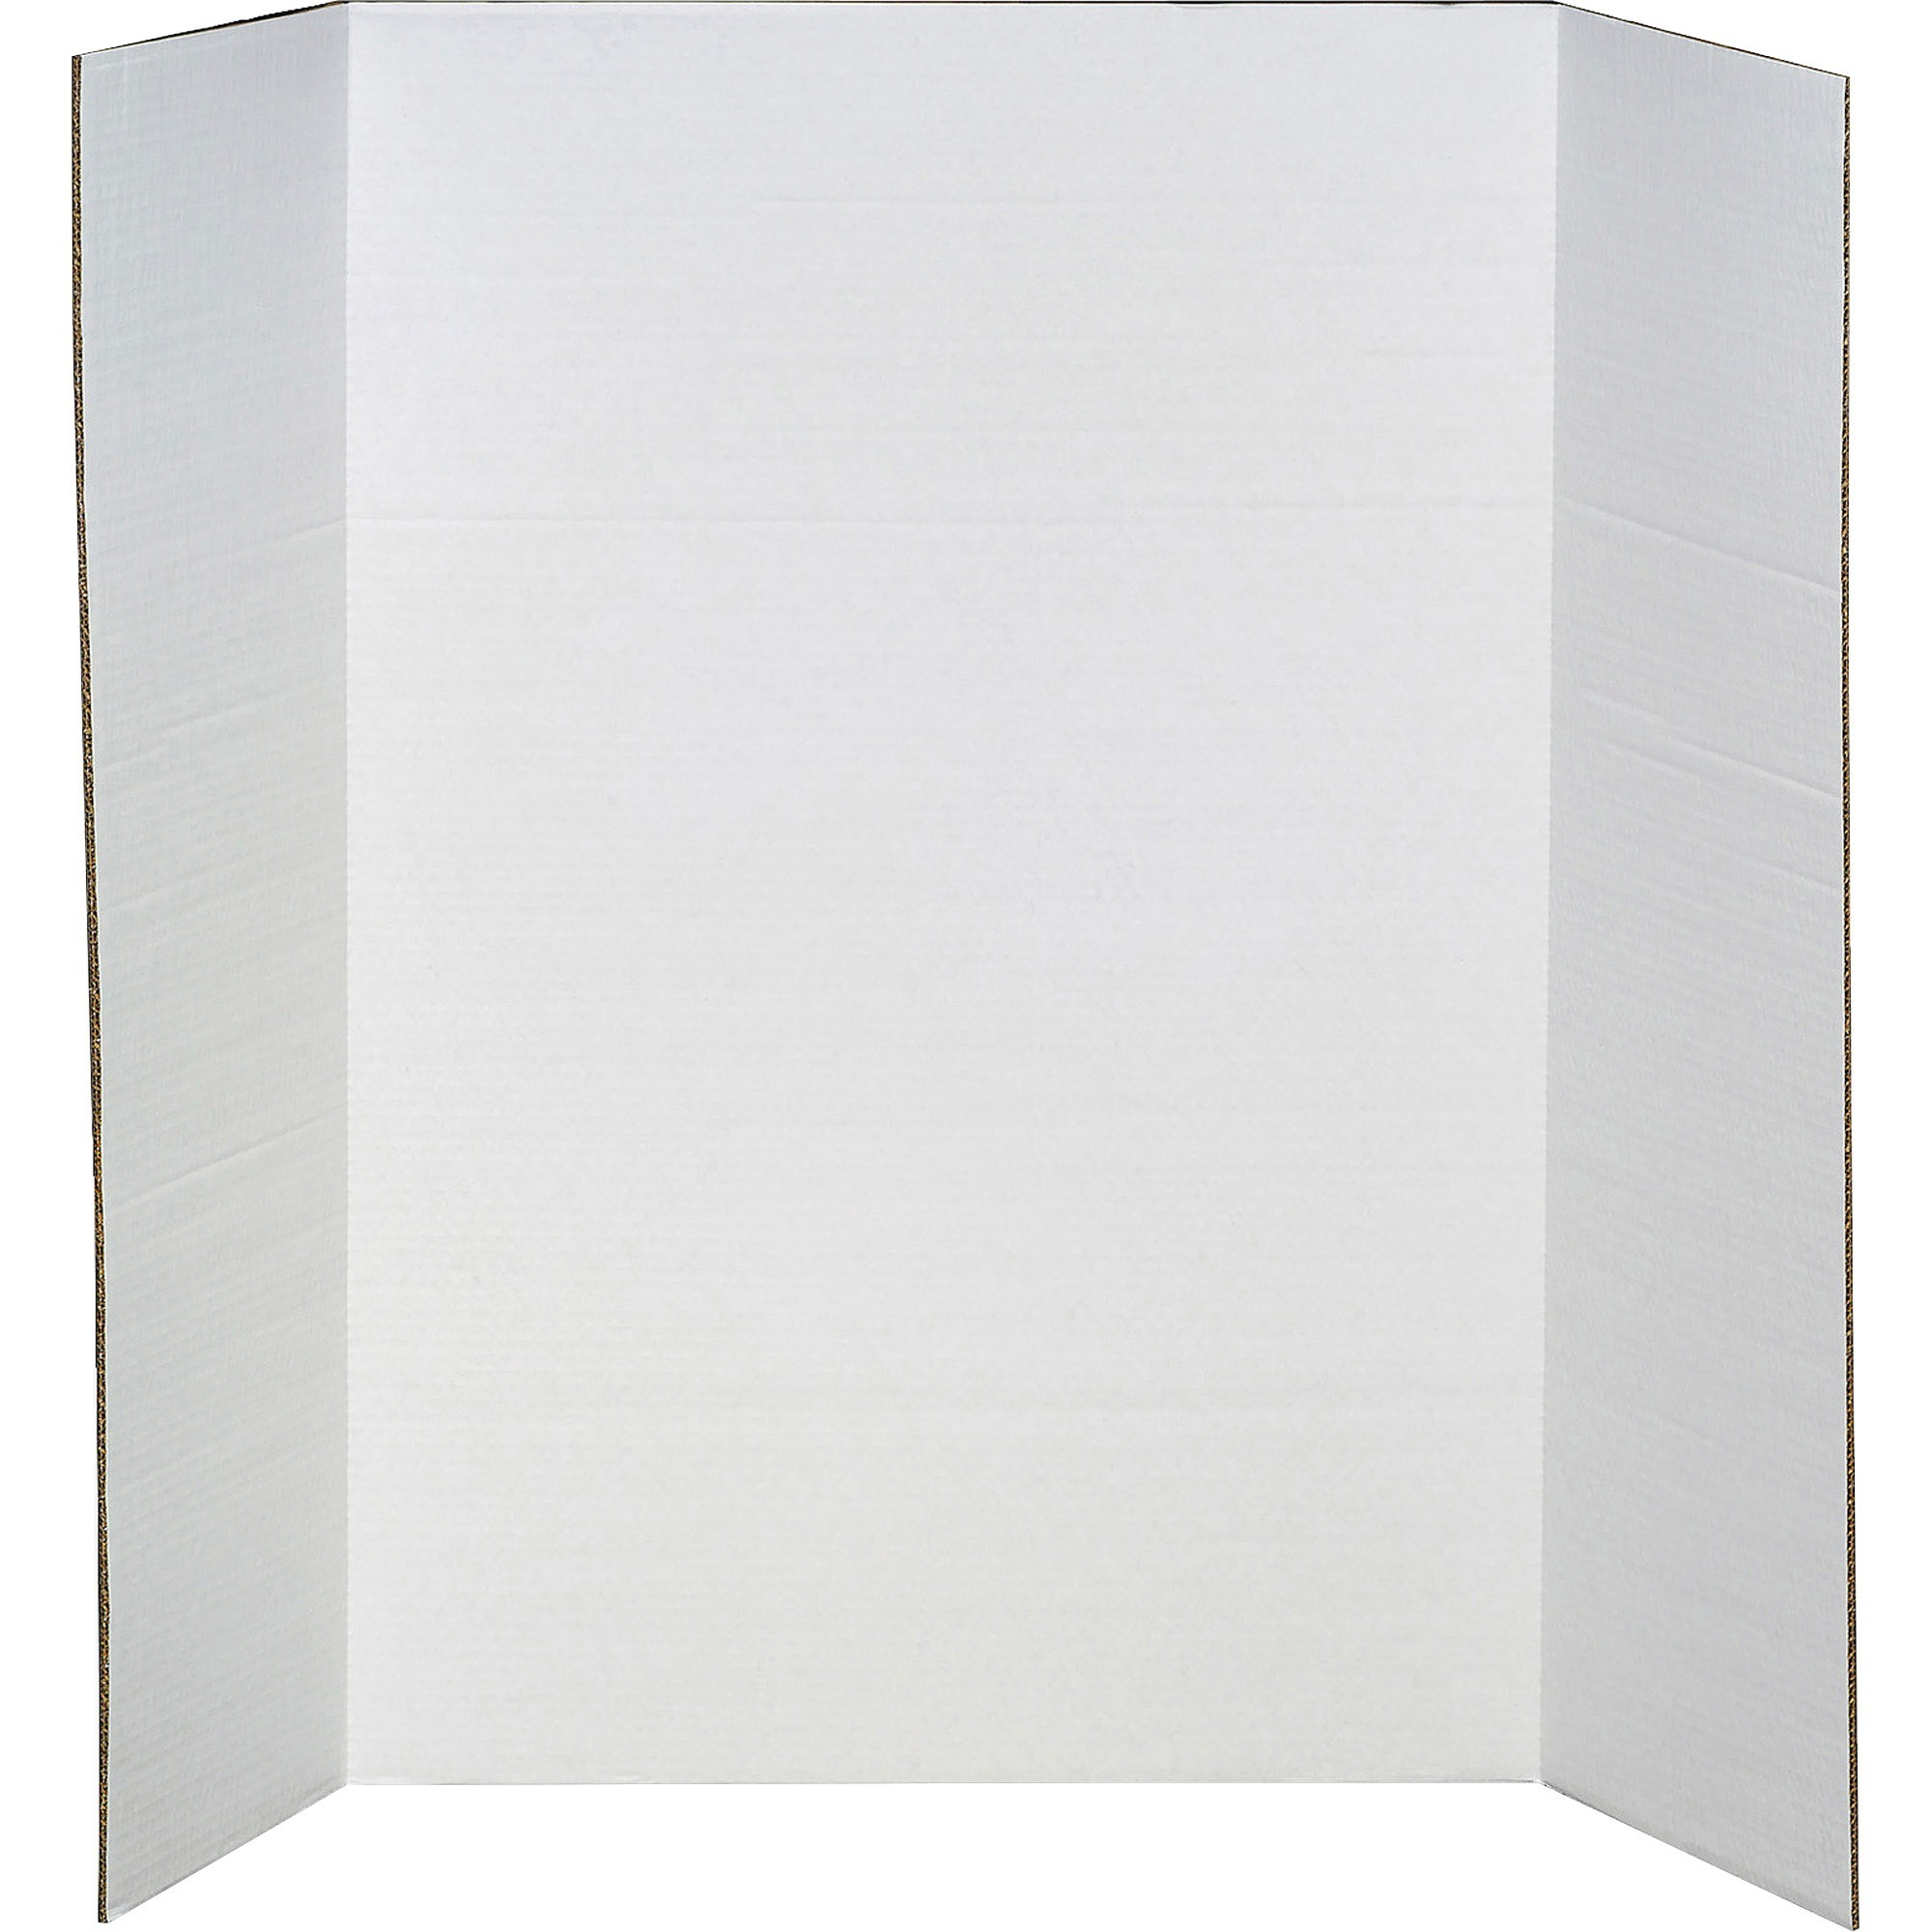 elmer s heavy duty corrugated tri fold display board 36 x 48 white walmart com